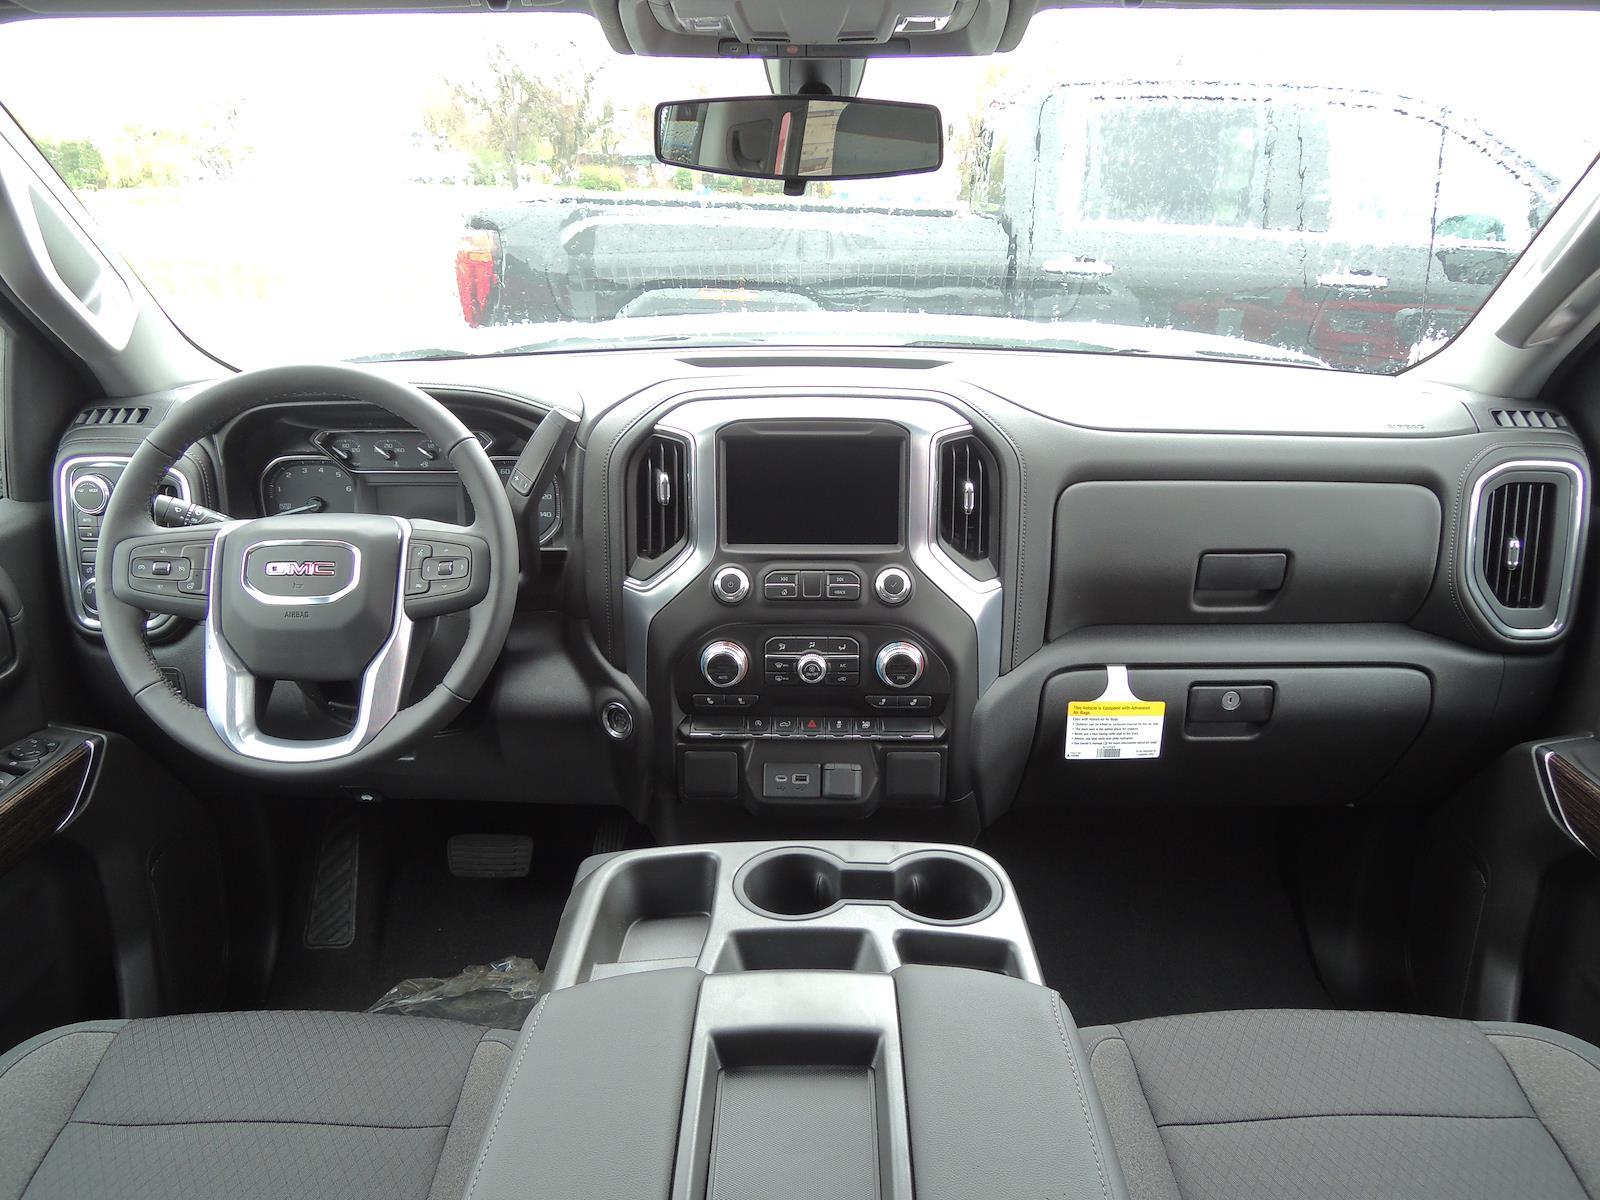 2021 GMC Sierra 1500 Crew Cab 4x4, Pickup #MT636 - photo 4